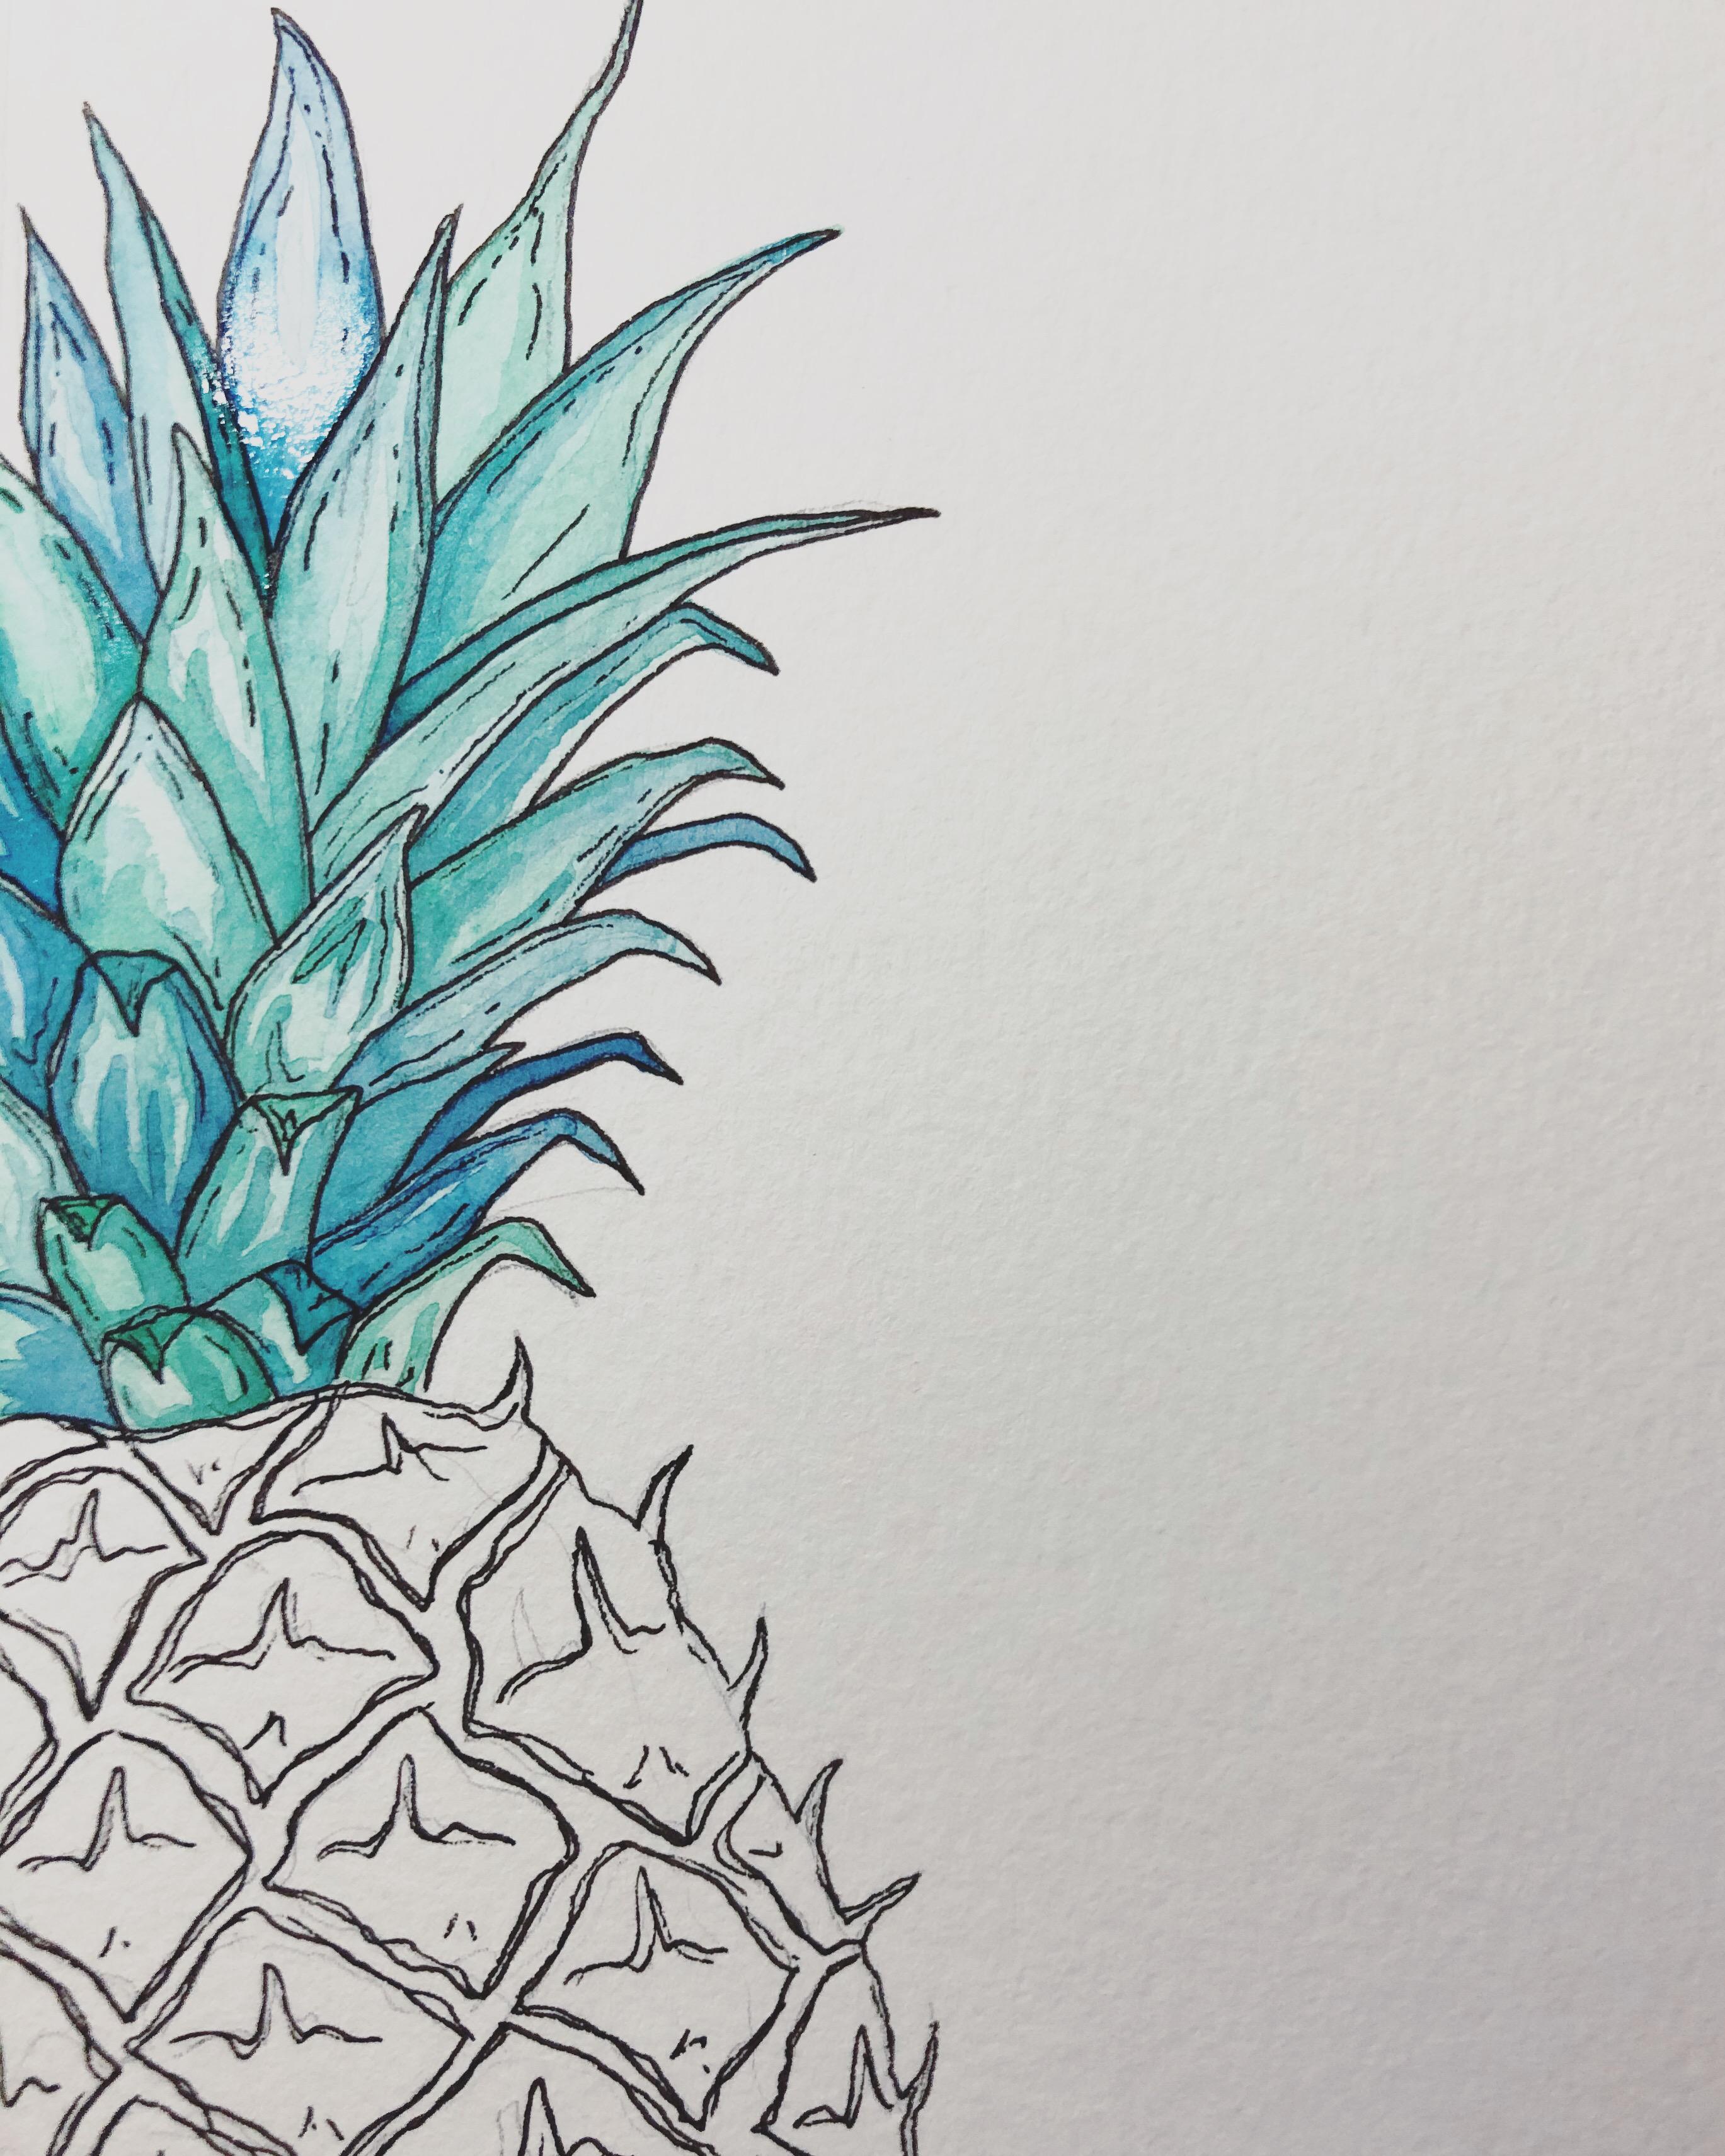 Pineapple on Top